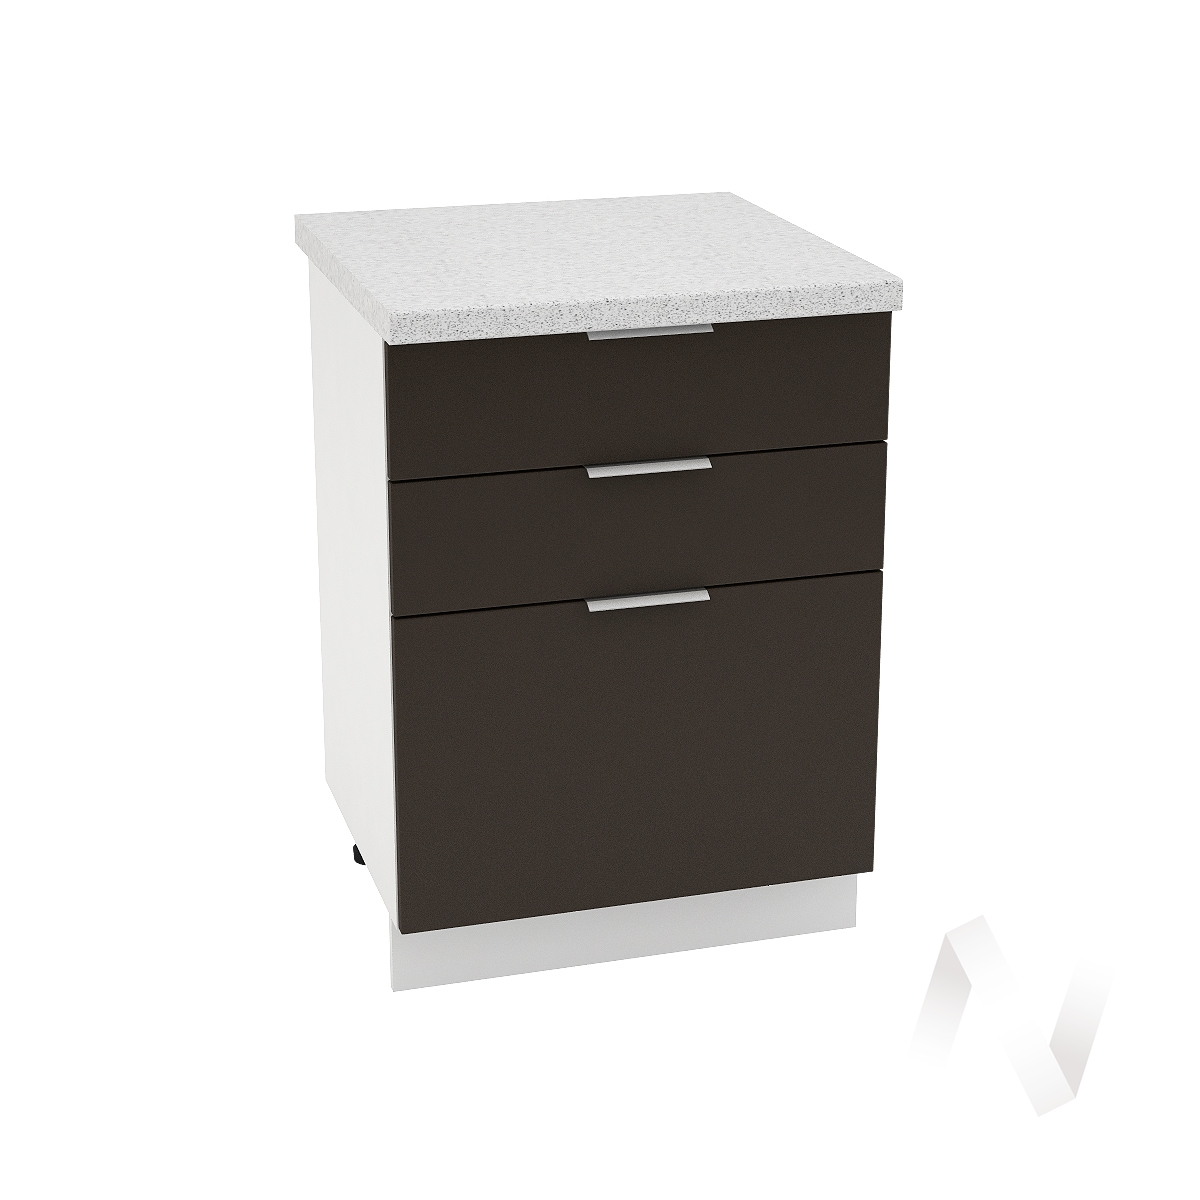 "Кухня ""Терра"": Шкаф нижний с 3-мя ящиками 600, ШН3Я 600 (смоки софт/корпус белый)"